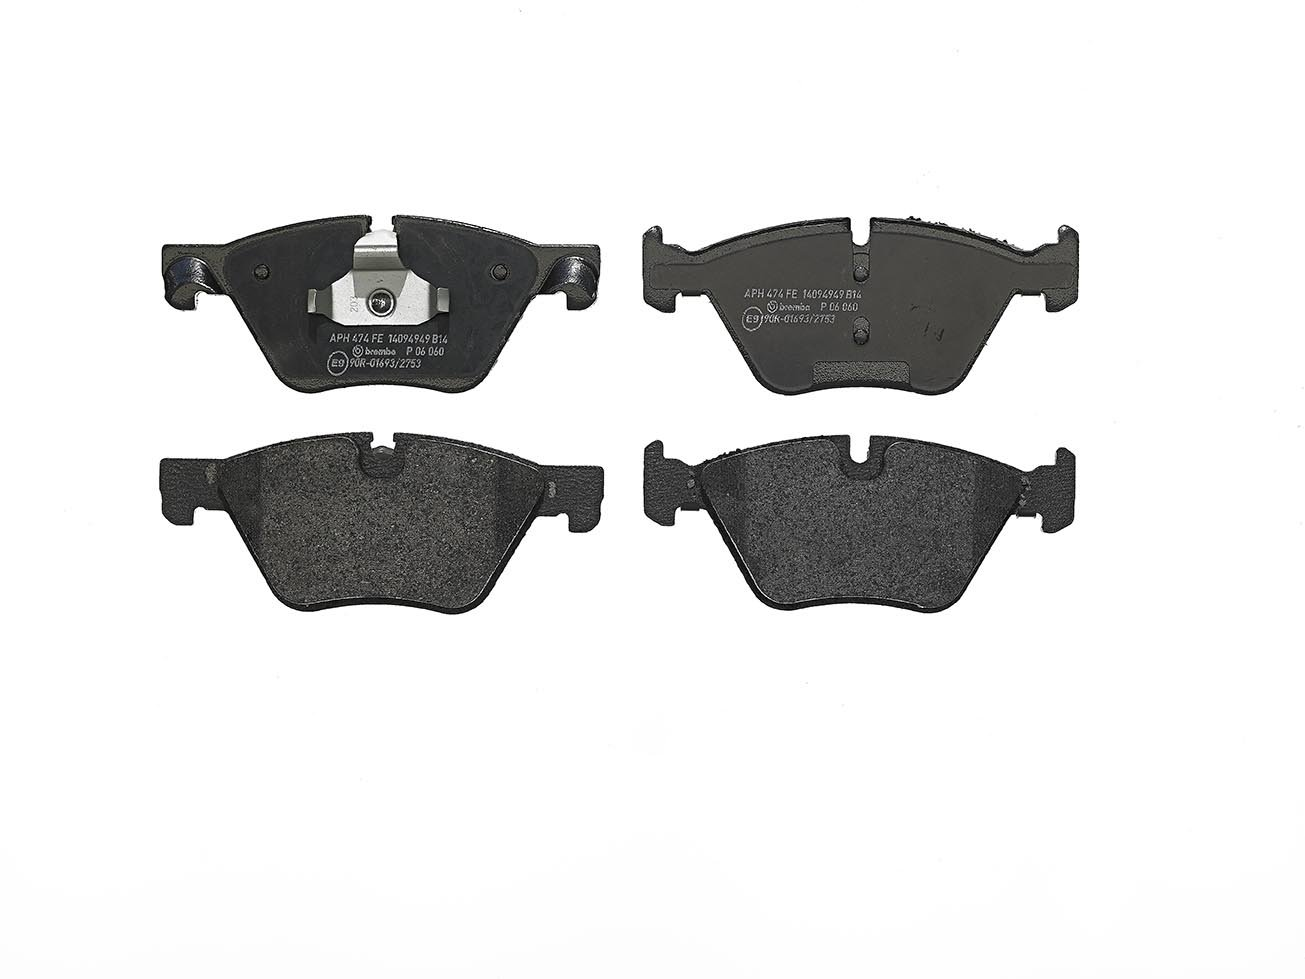 Brembo P06060 Front Disc Brake Pad Set of 4